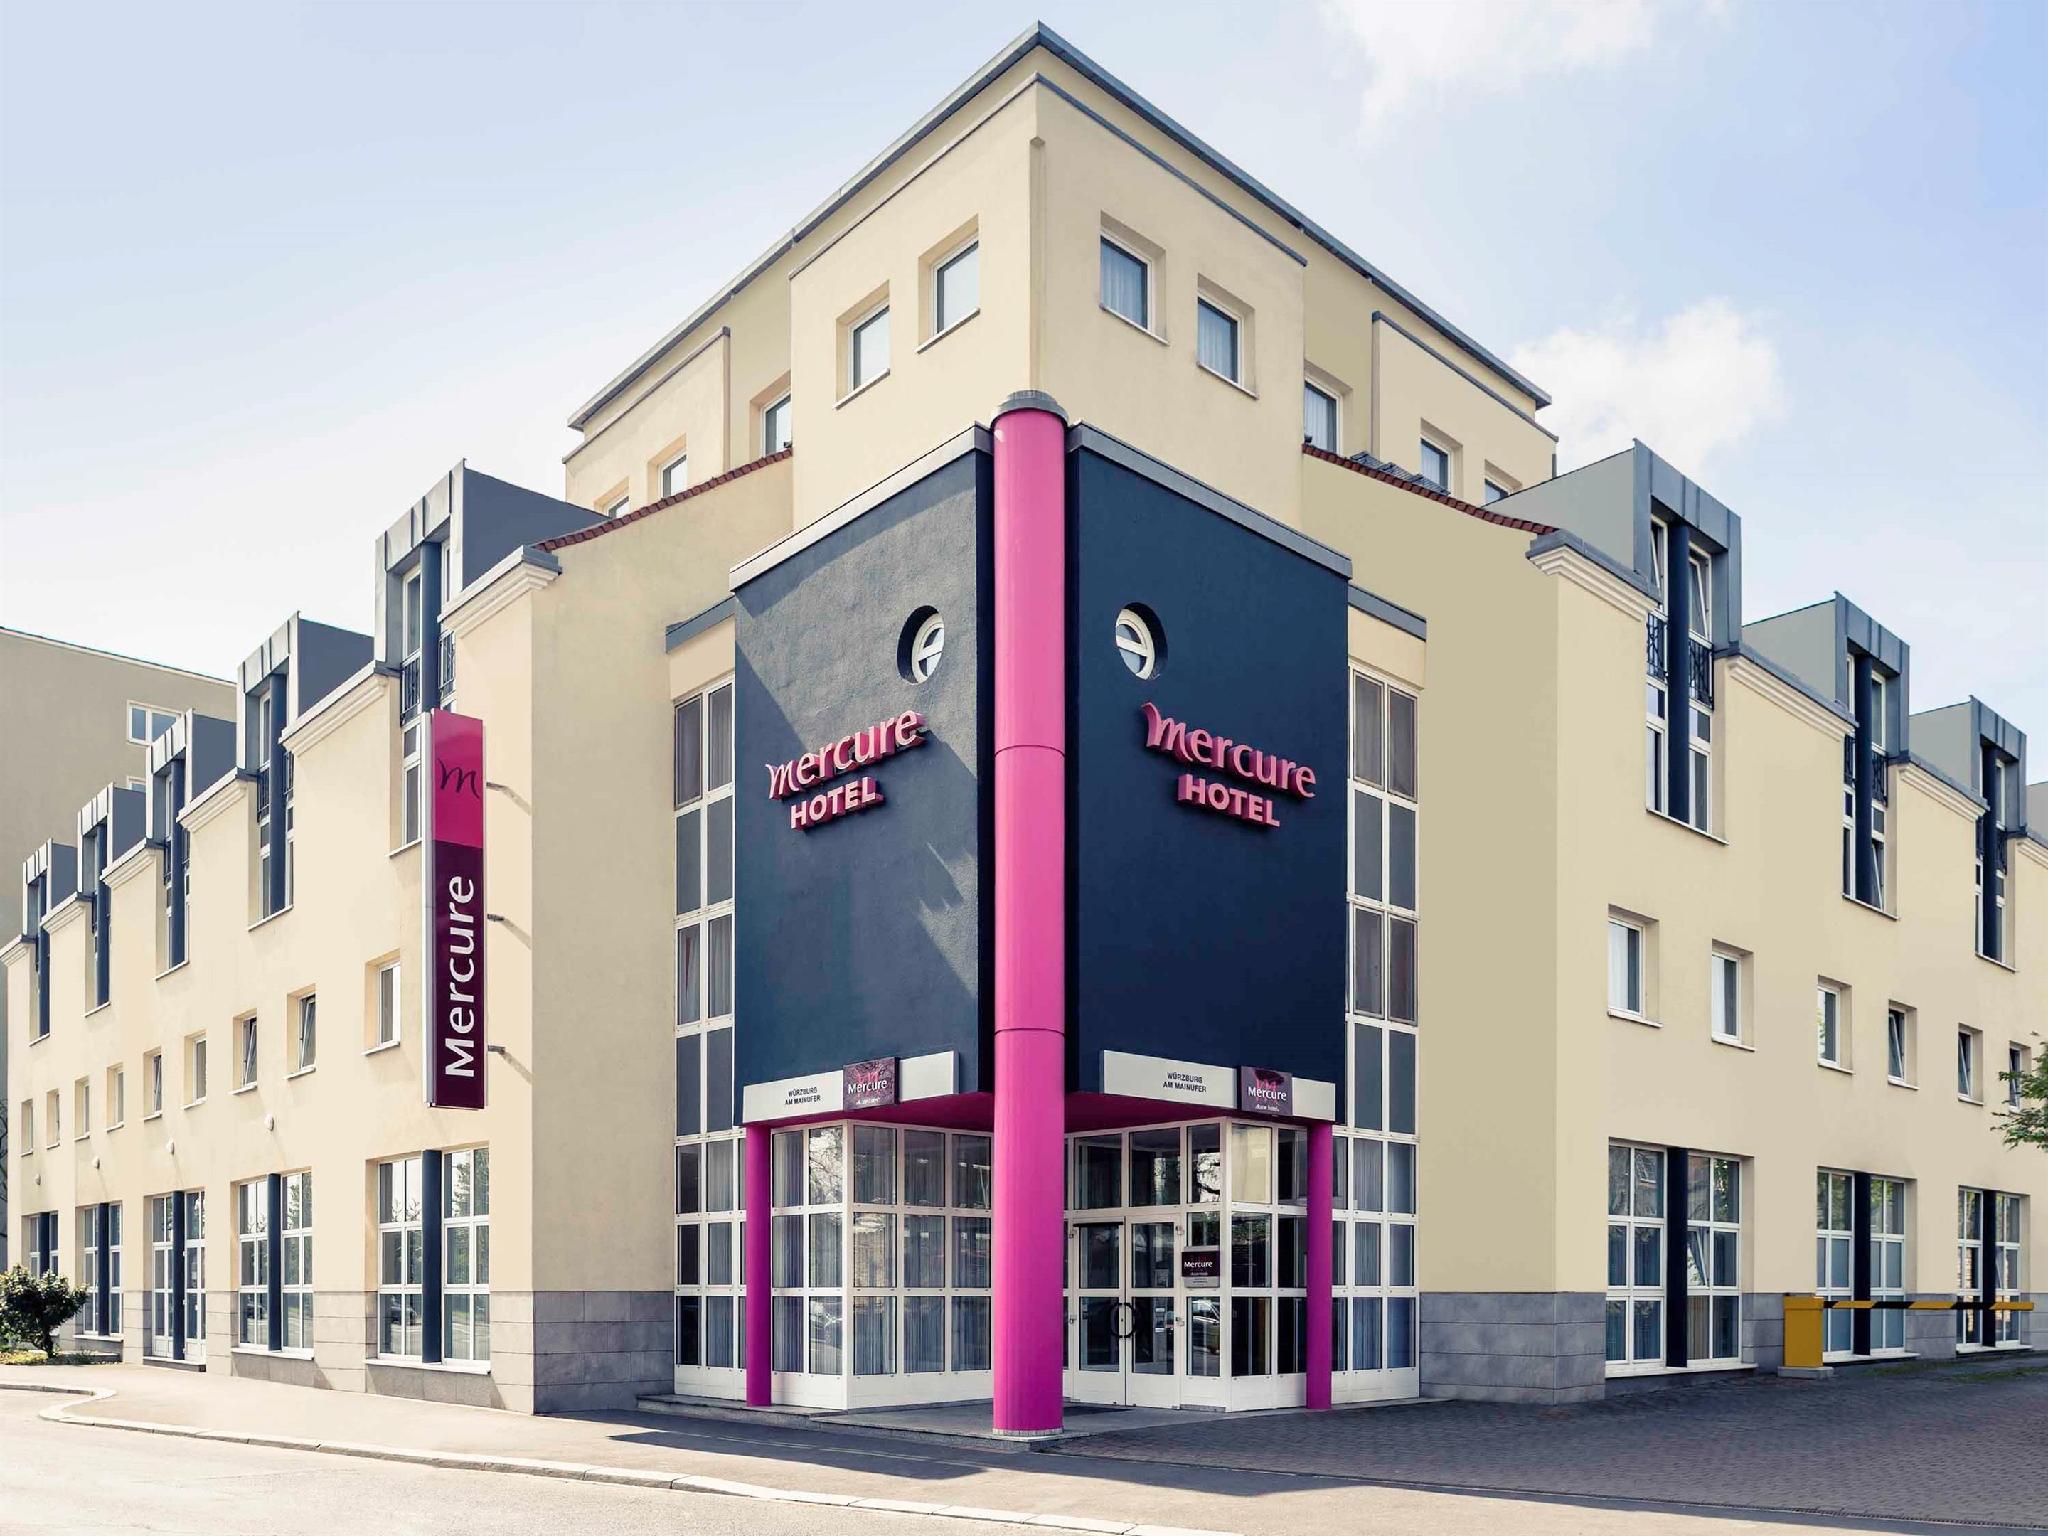 Mercure Hotel Wuerzburg am Mainufer, Würzburg